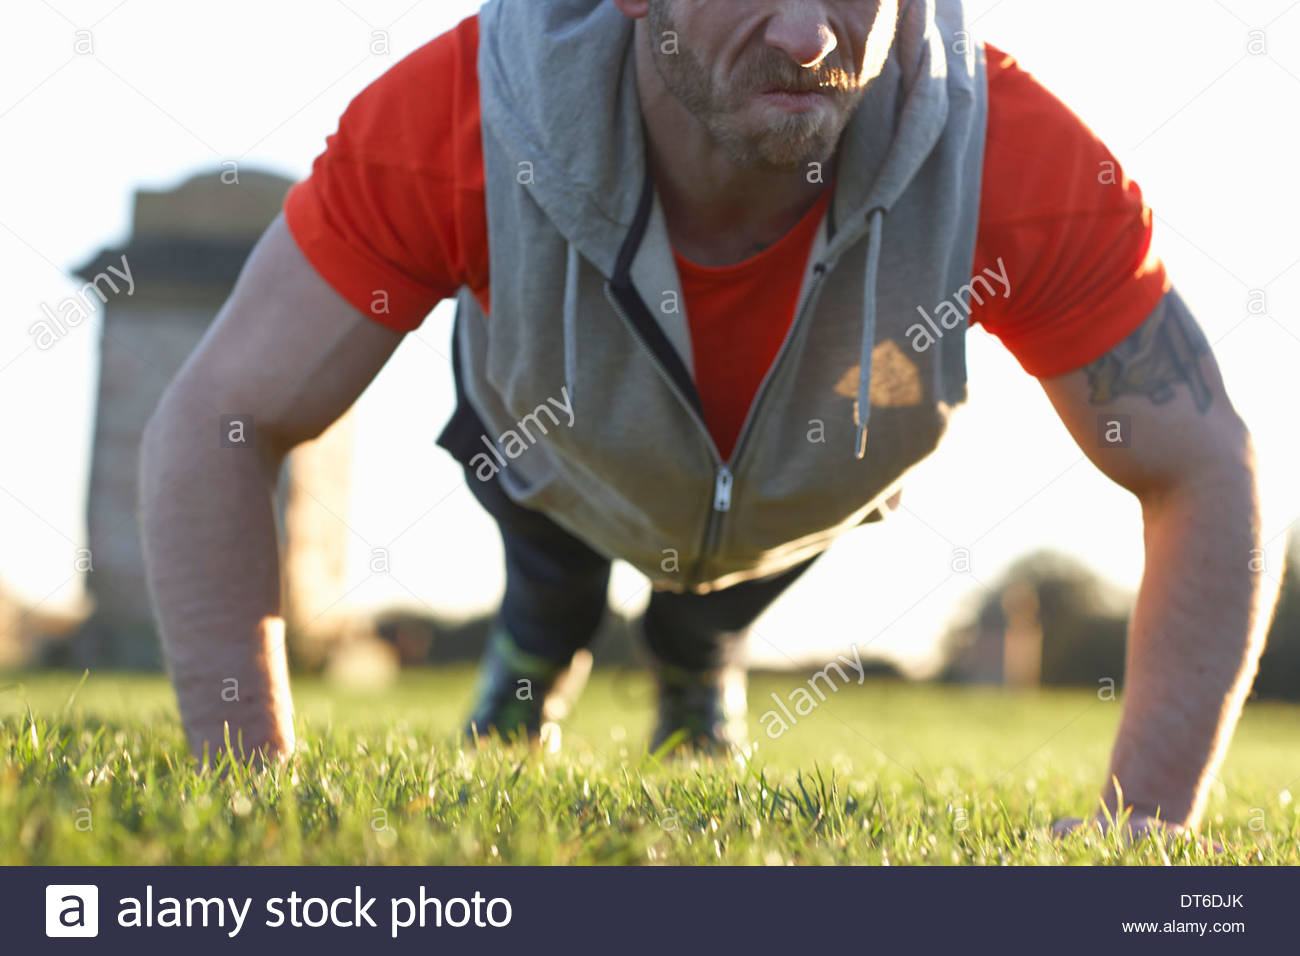 Young man doing push ups - Stock Image